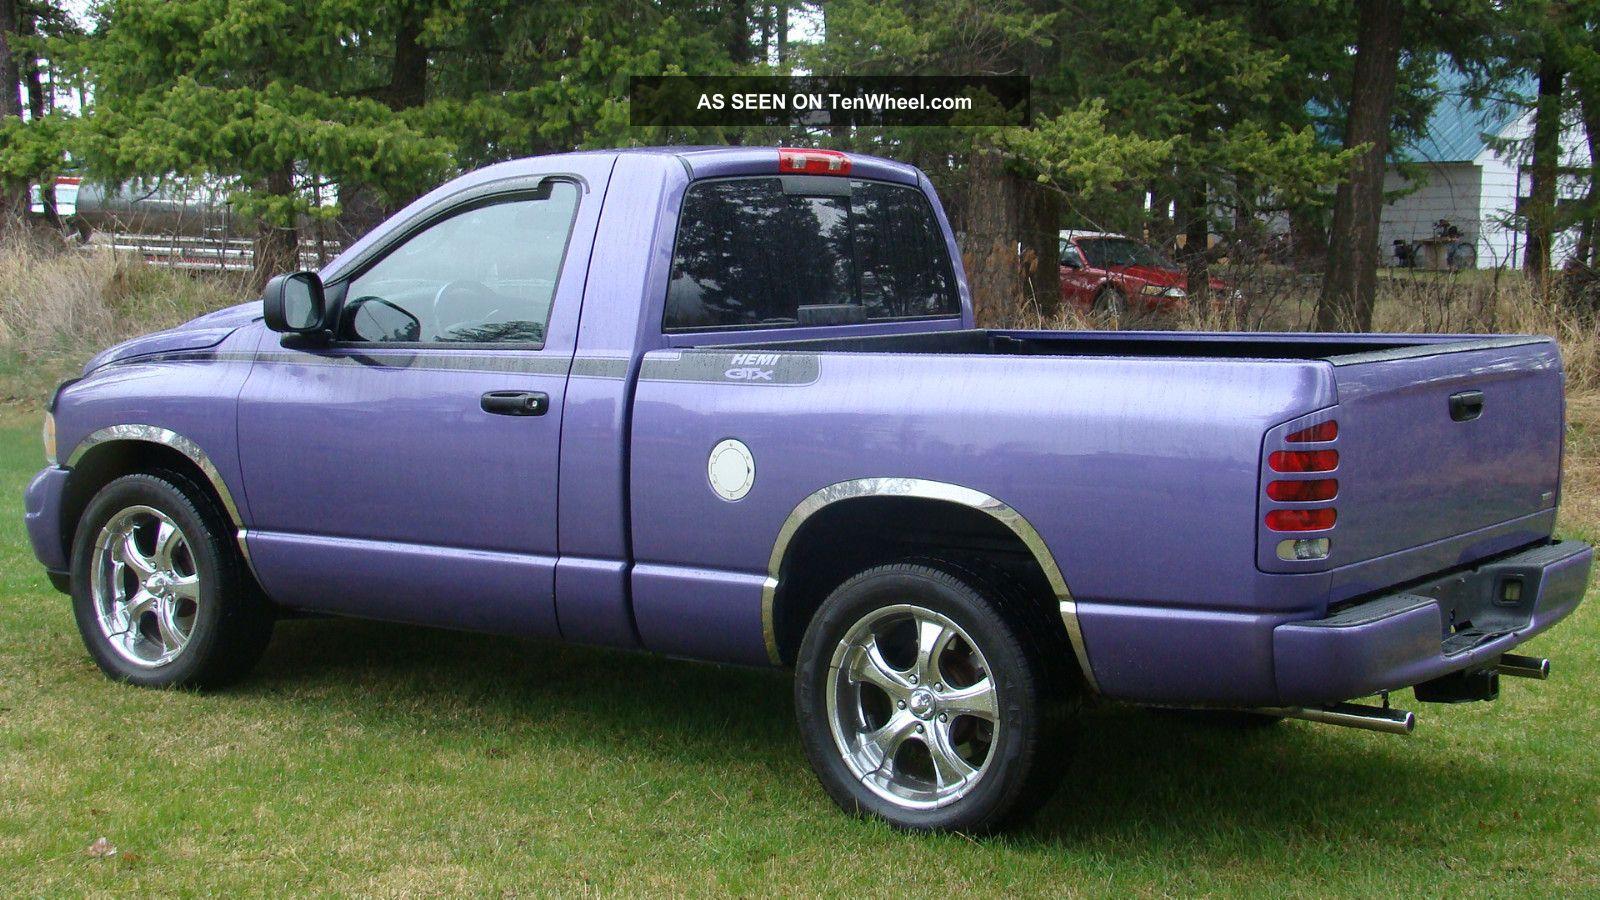 2004 dodge ram 1500 slt standard cab pickup 2 door 5 7l hemi gtx. Black Bedroom Furniture Sets. Home Design Ideas